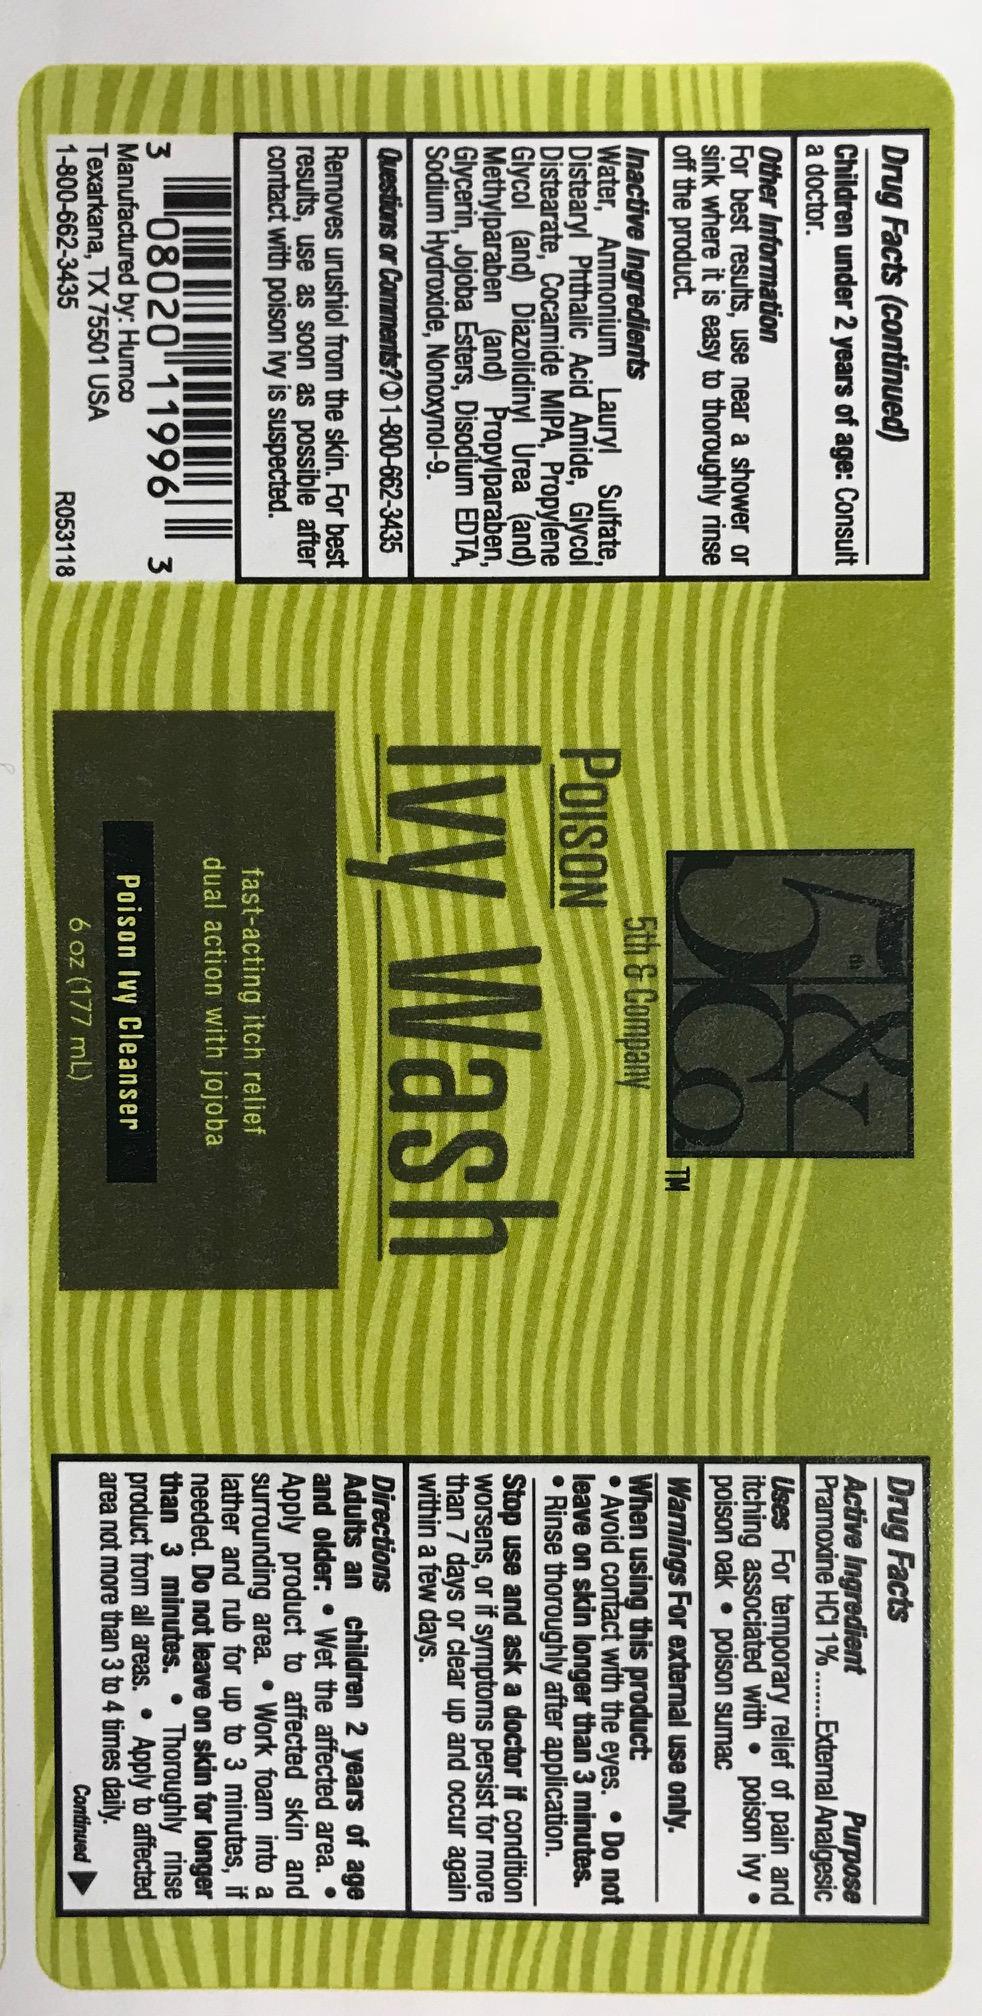 Poison Ivy Label